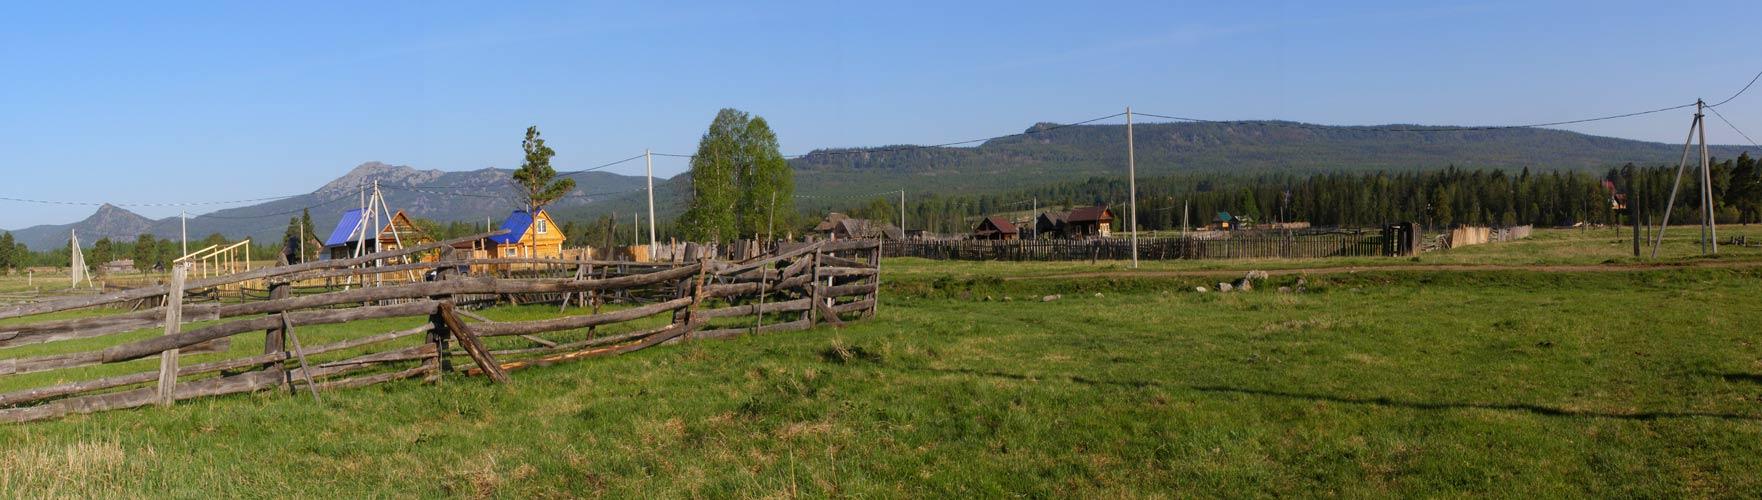 башкирия арский камень схема проезда из оренбурга